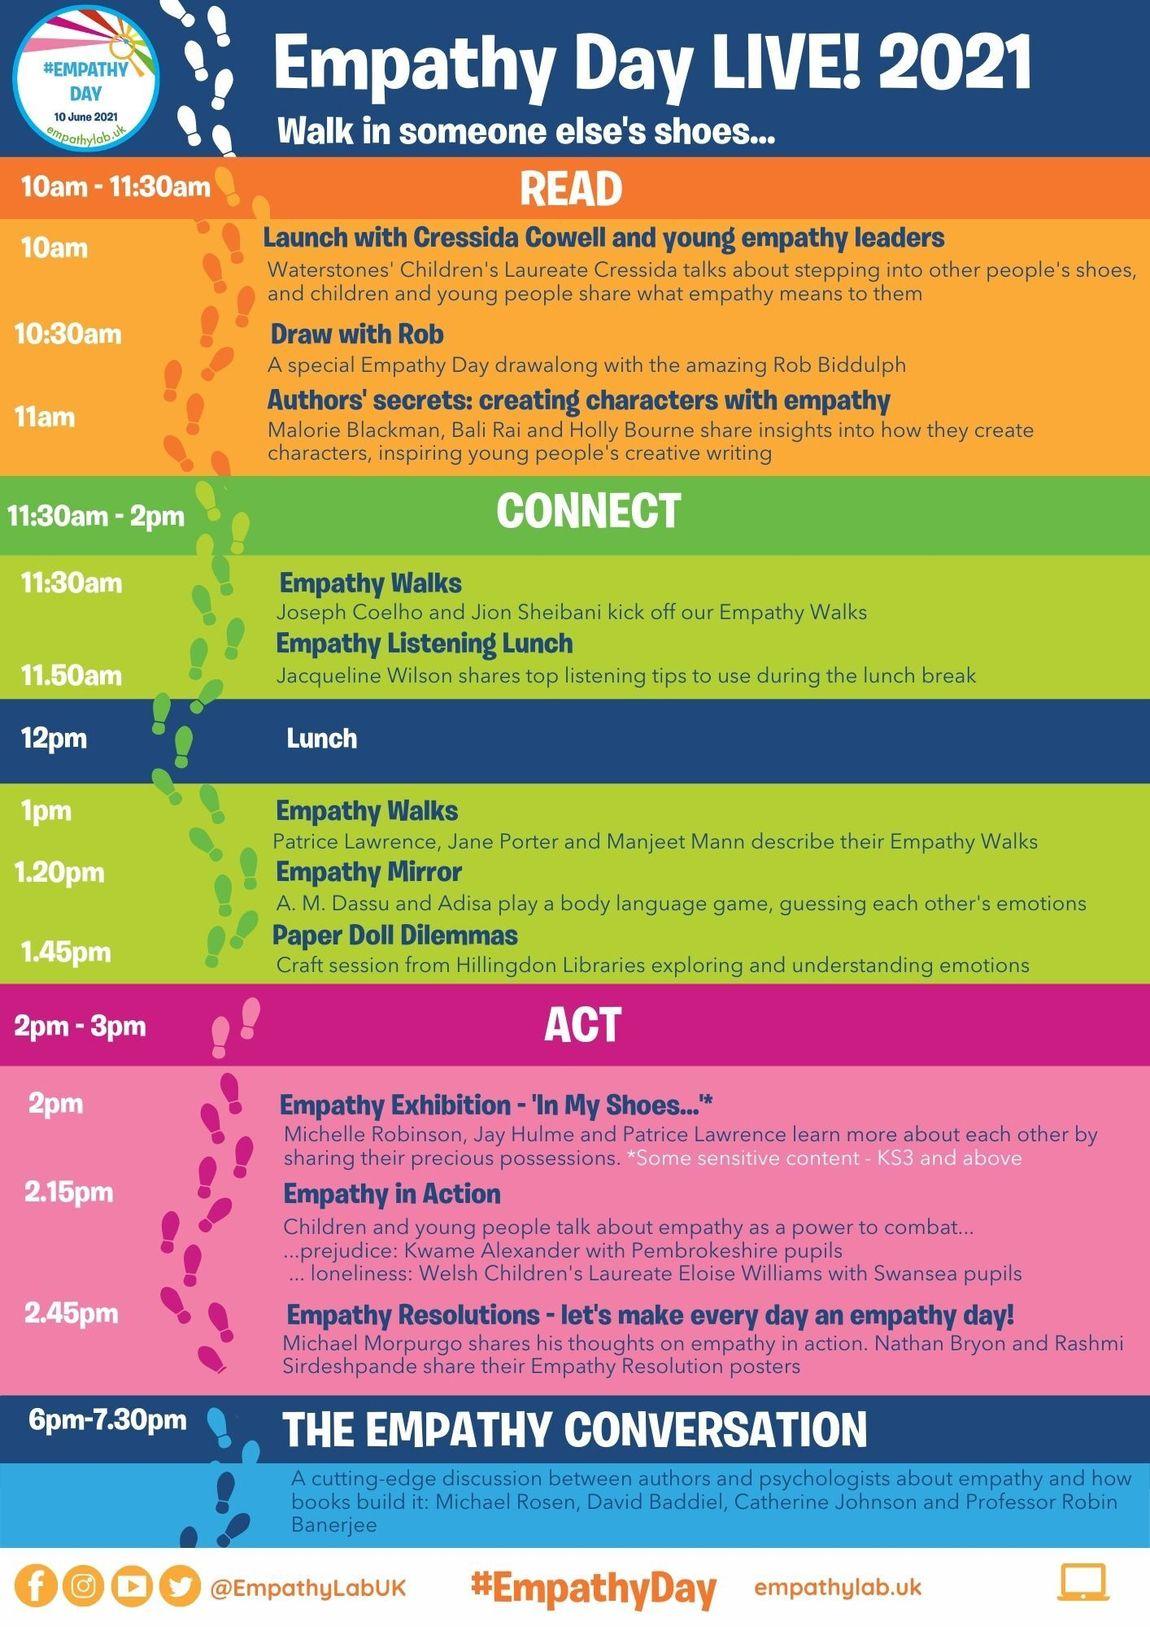 Empathy Day Live 2021 Programme